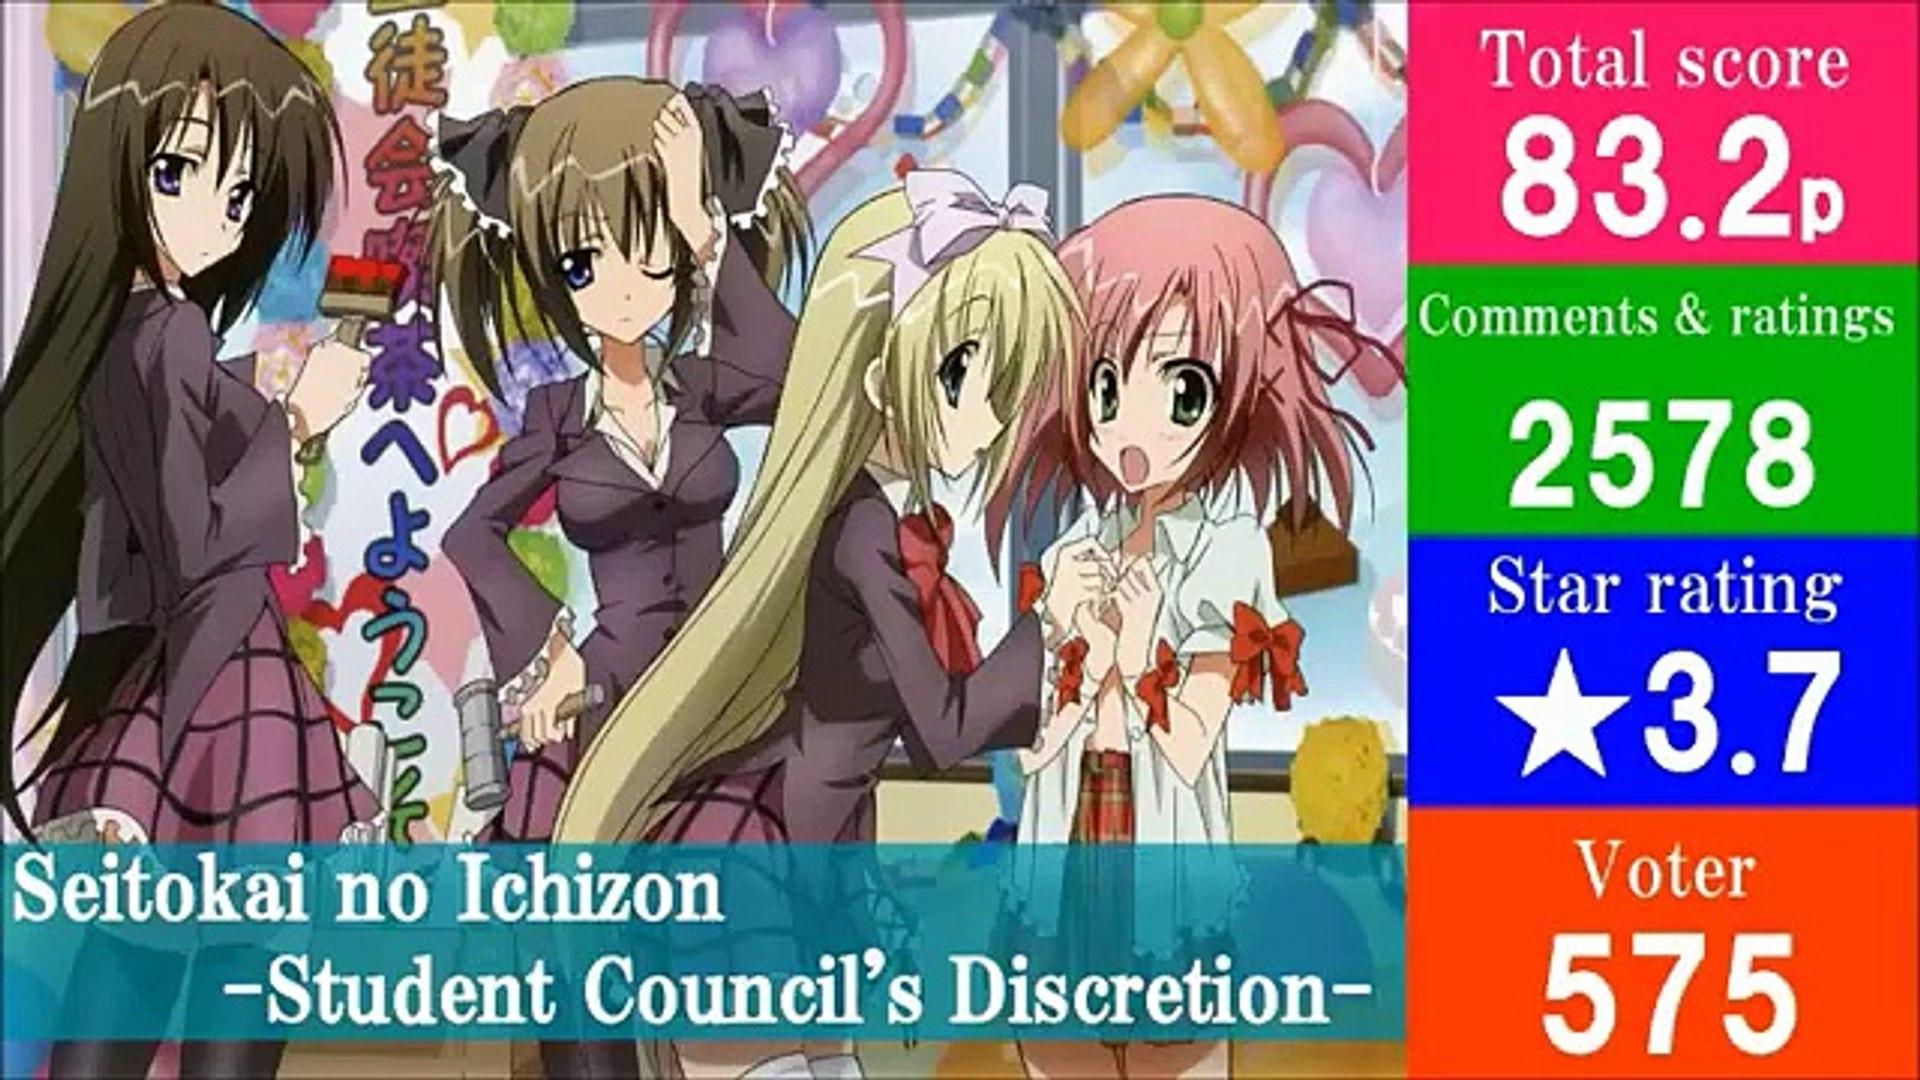 Top 10 Harlem anime Ranking / Best of japan anime 【BJA】